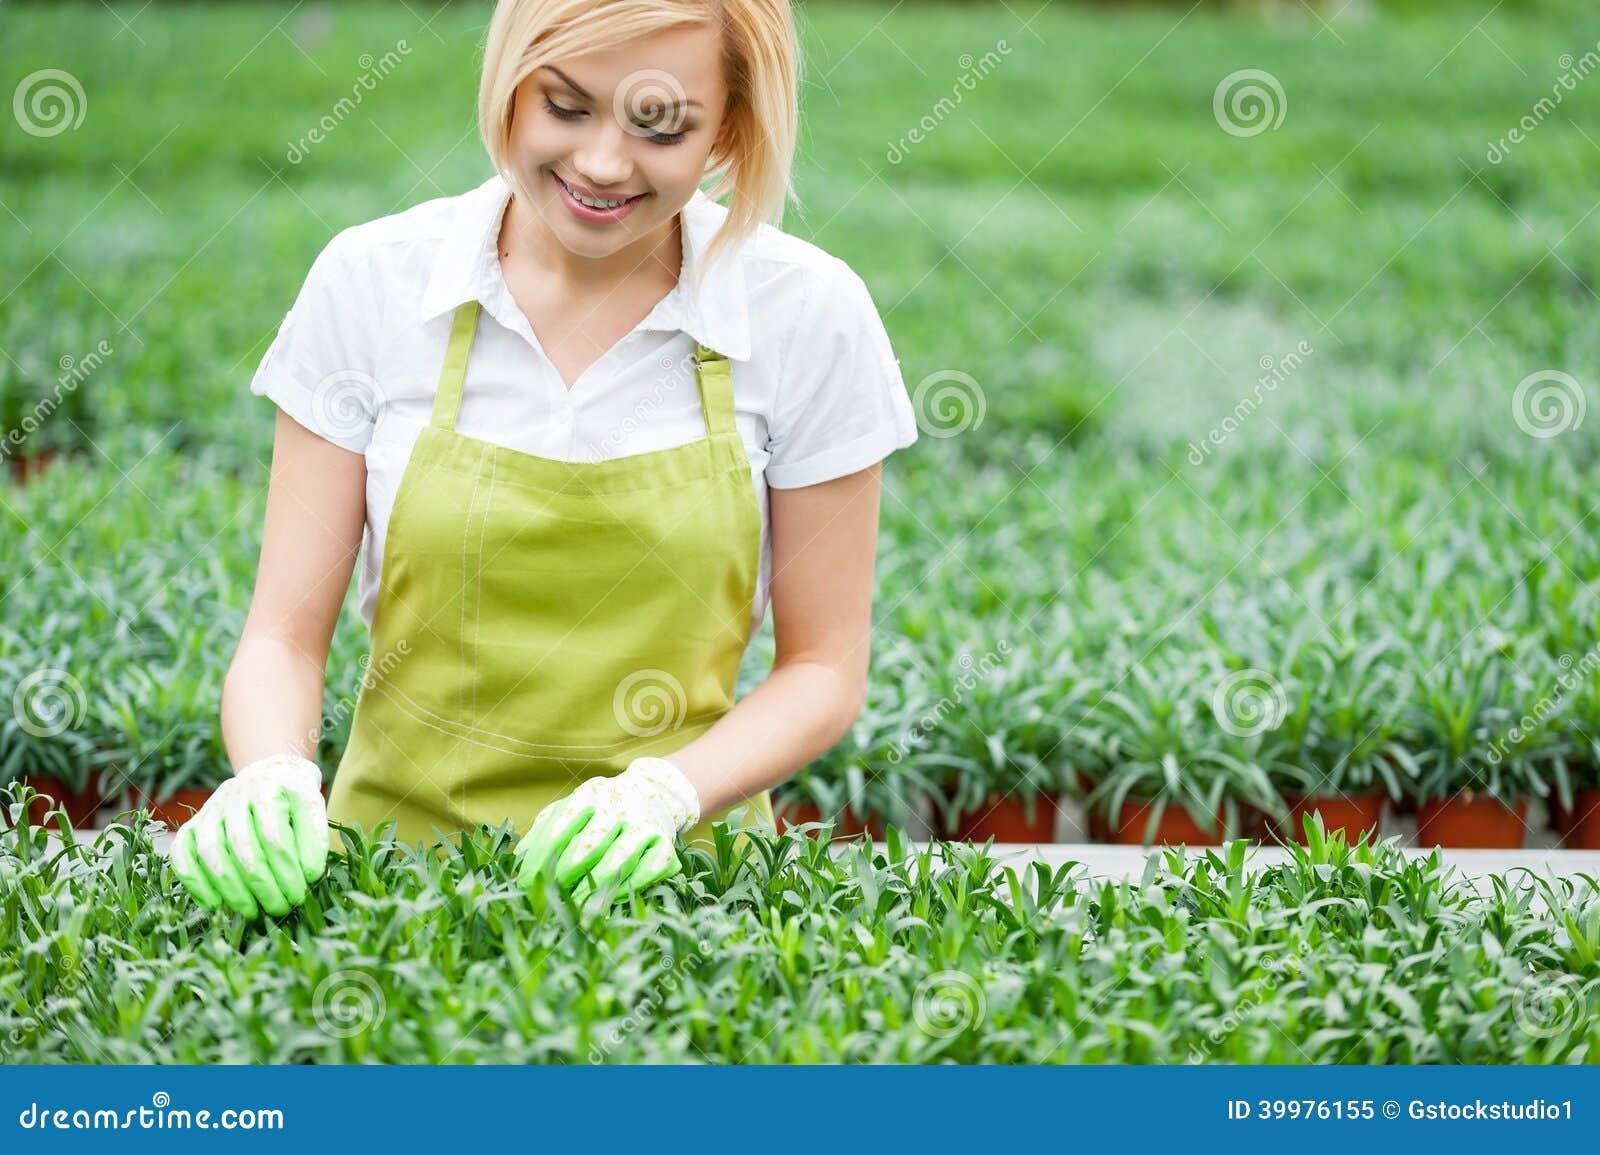 Woman Gardening Stock Photo Image 39976155